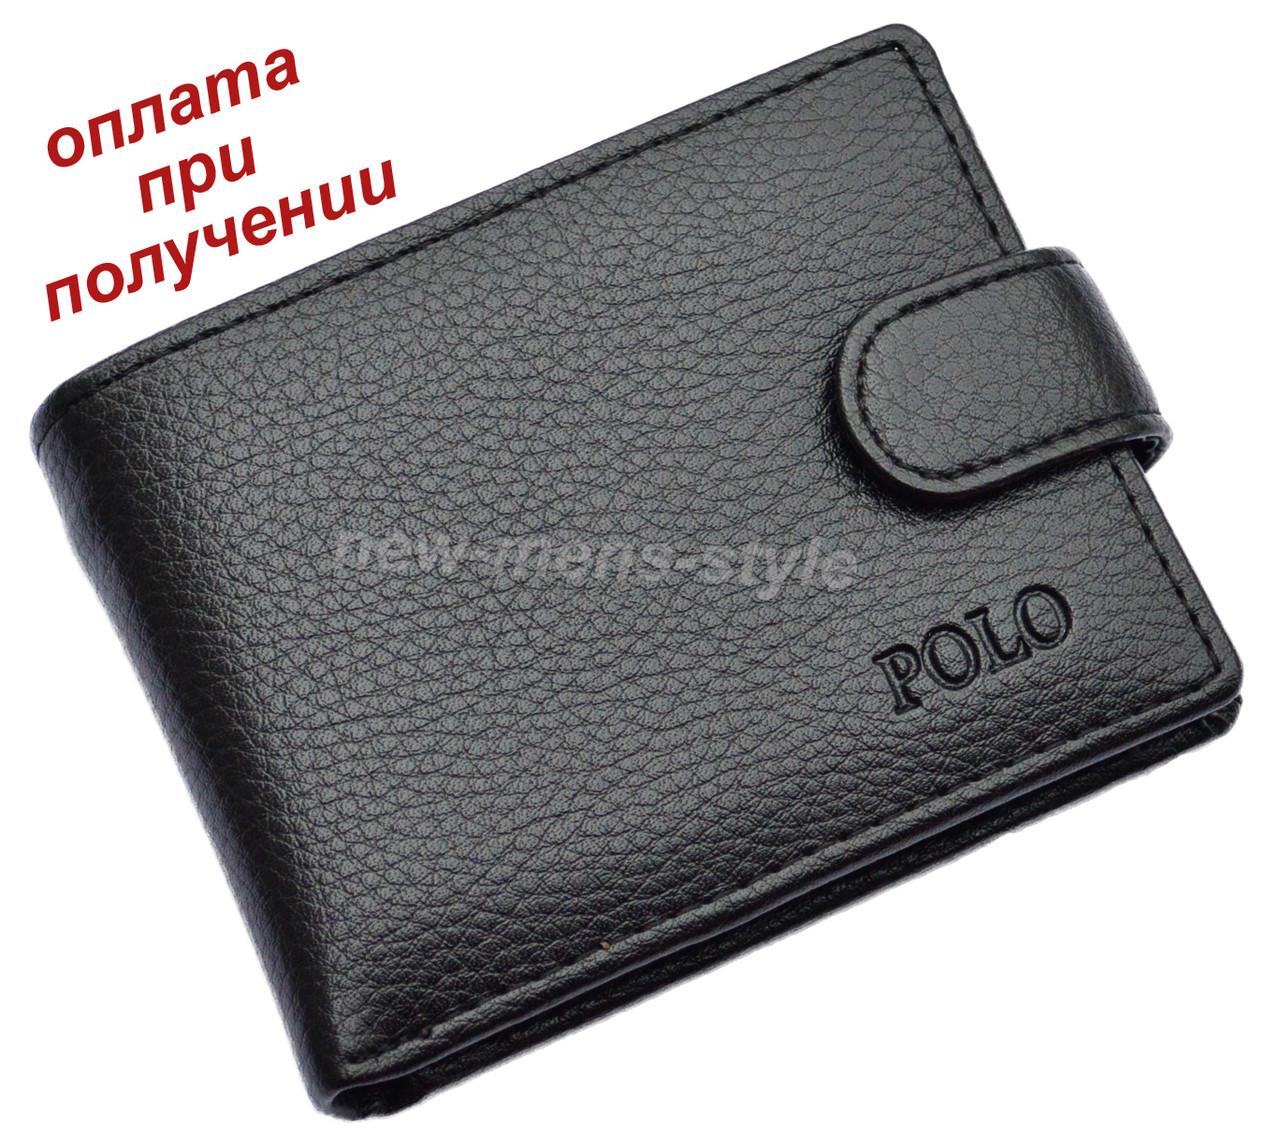 12a8232b3397 Мужской фирменный кожаный шкіряний кошелек портмоне бумажник POLO NEW -